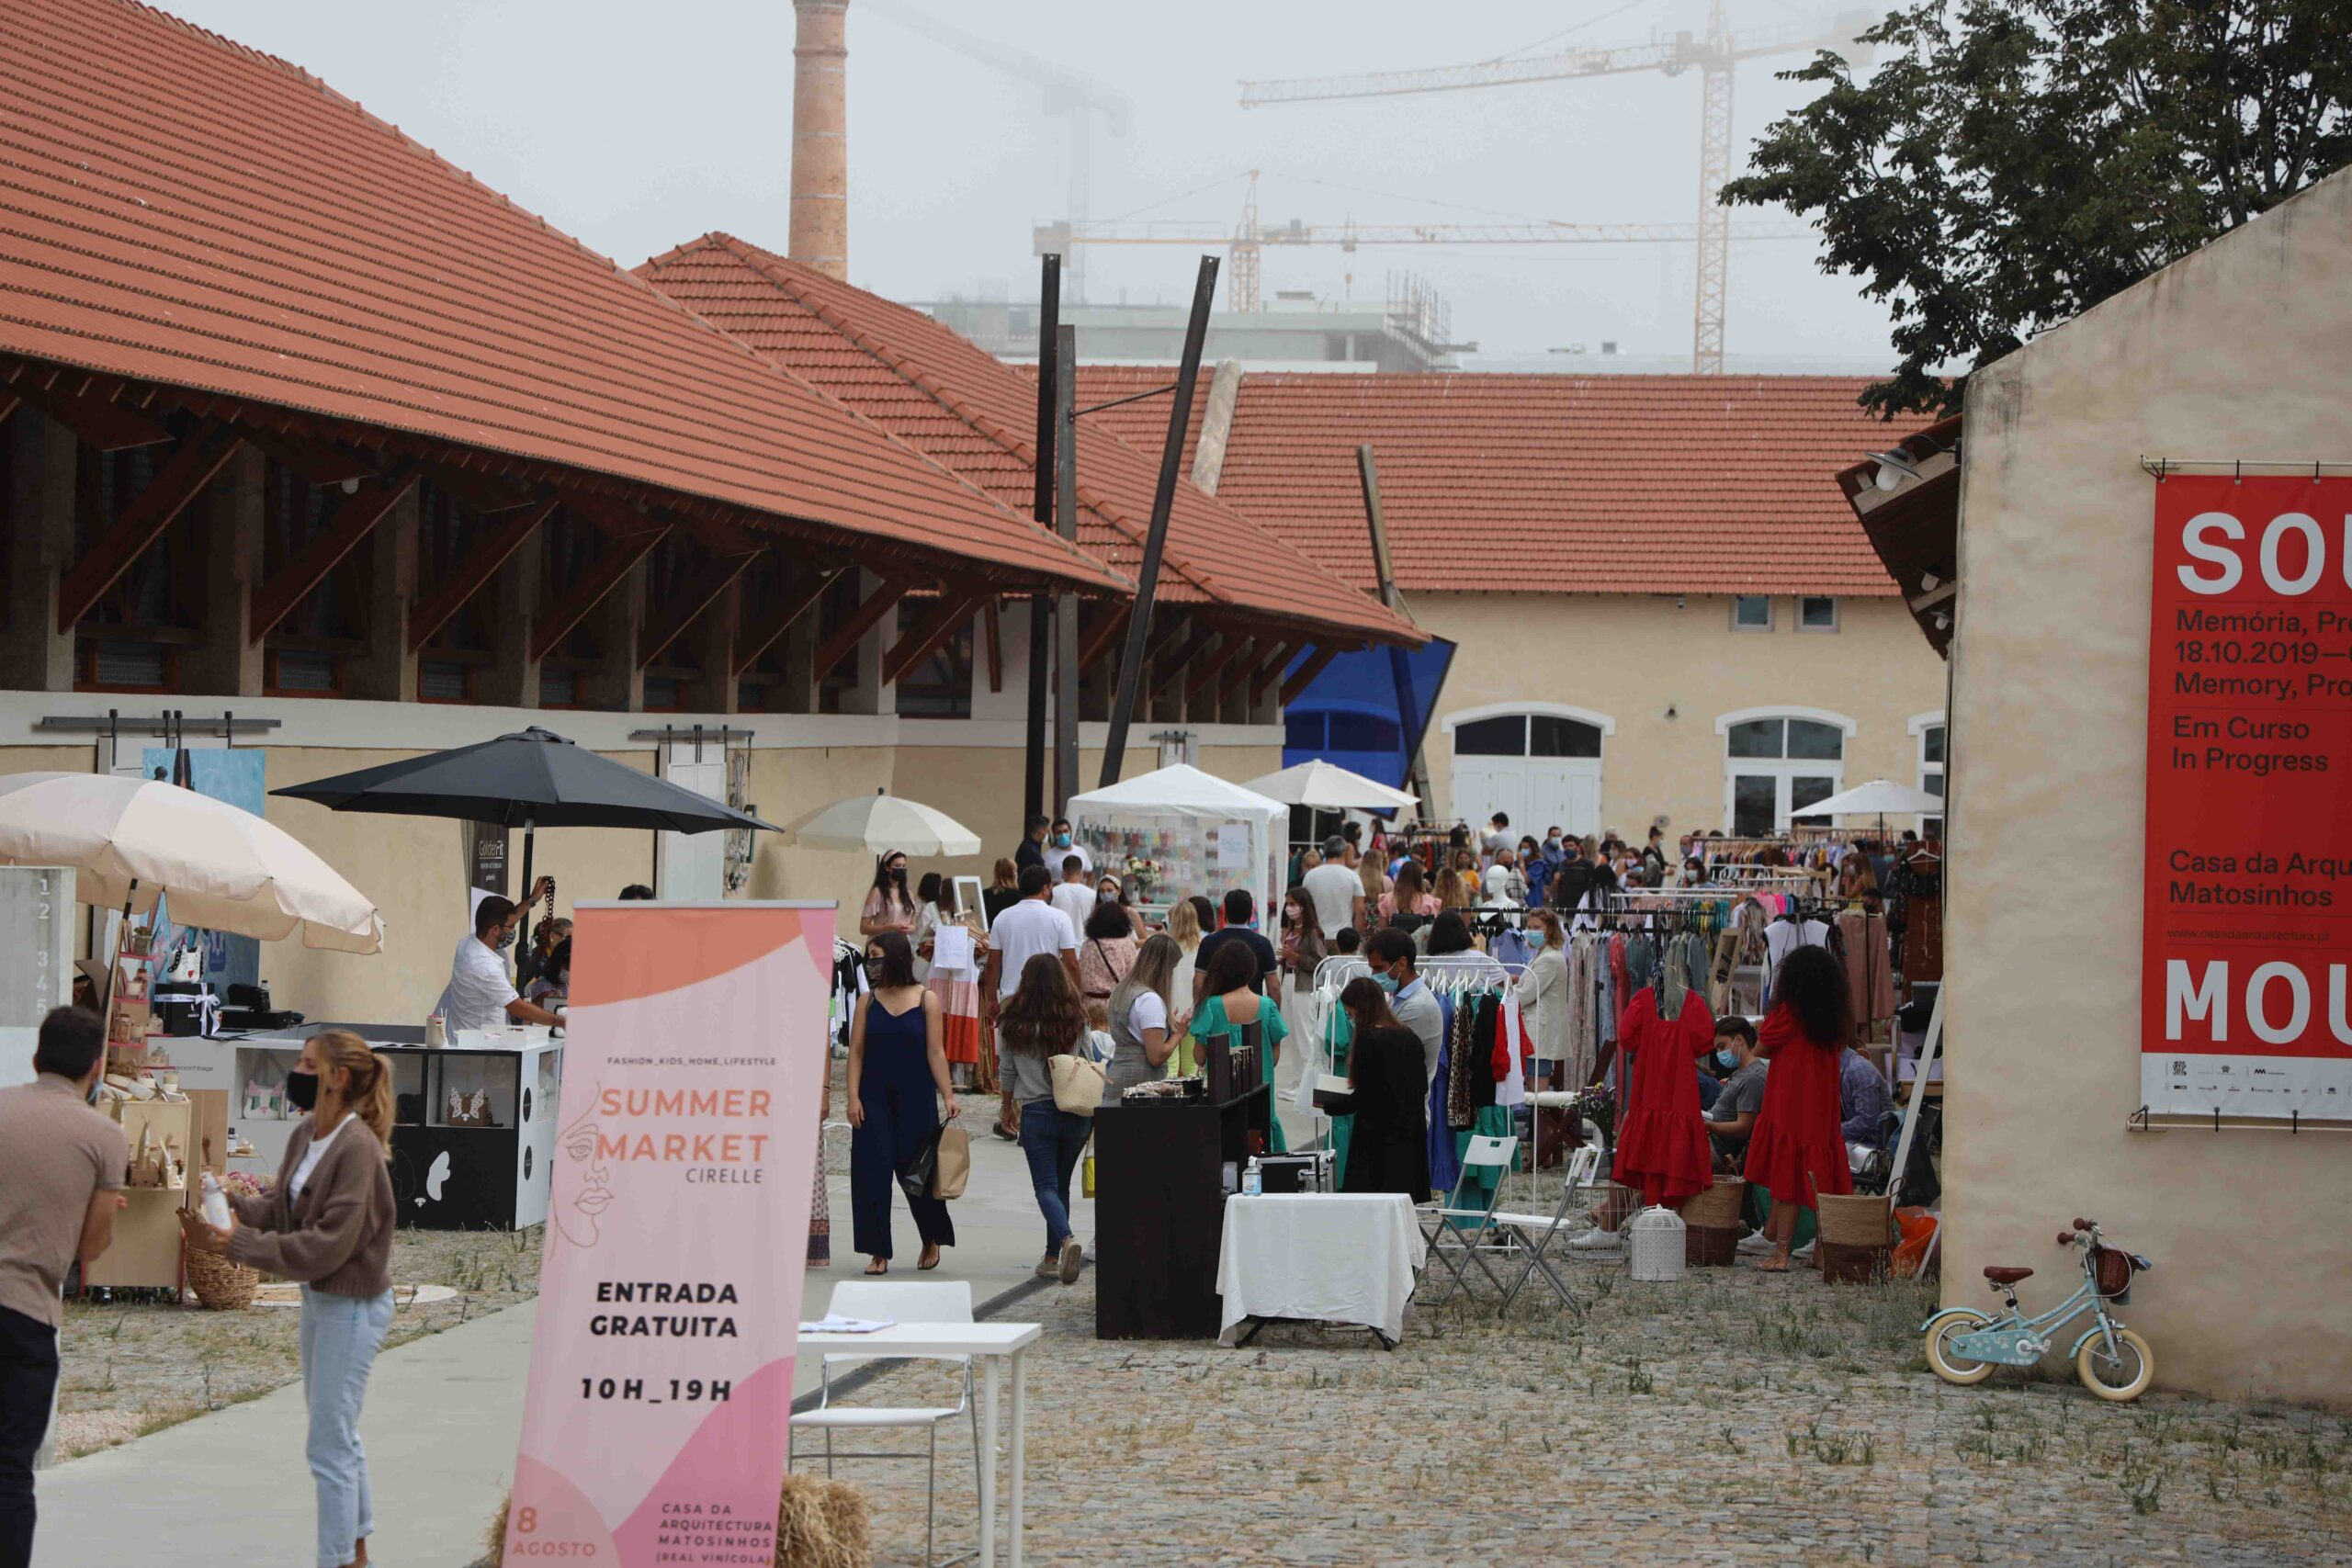 Cirelle Market – Casa da Arquitectura Matosinhos